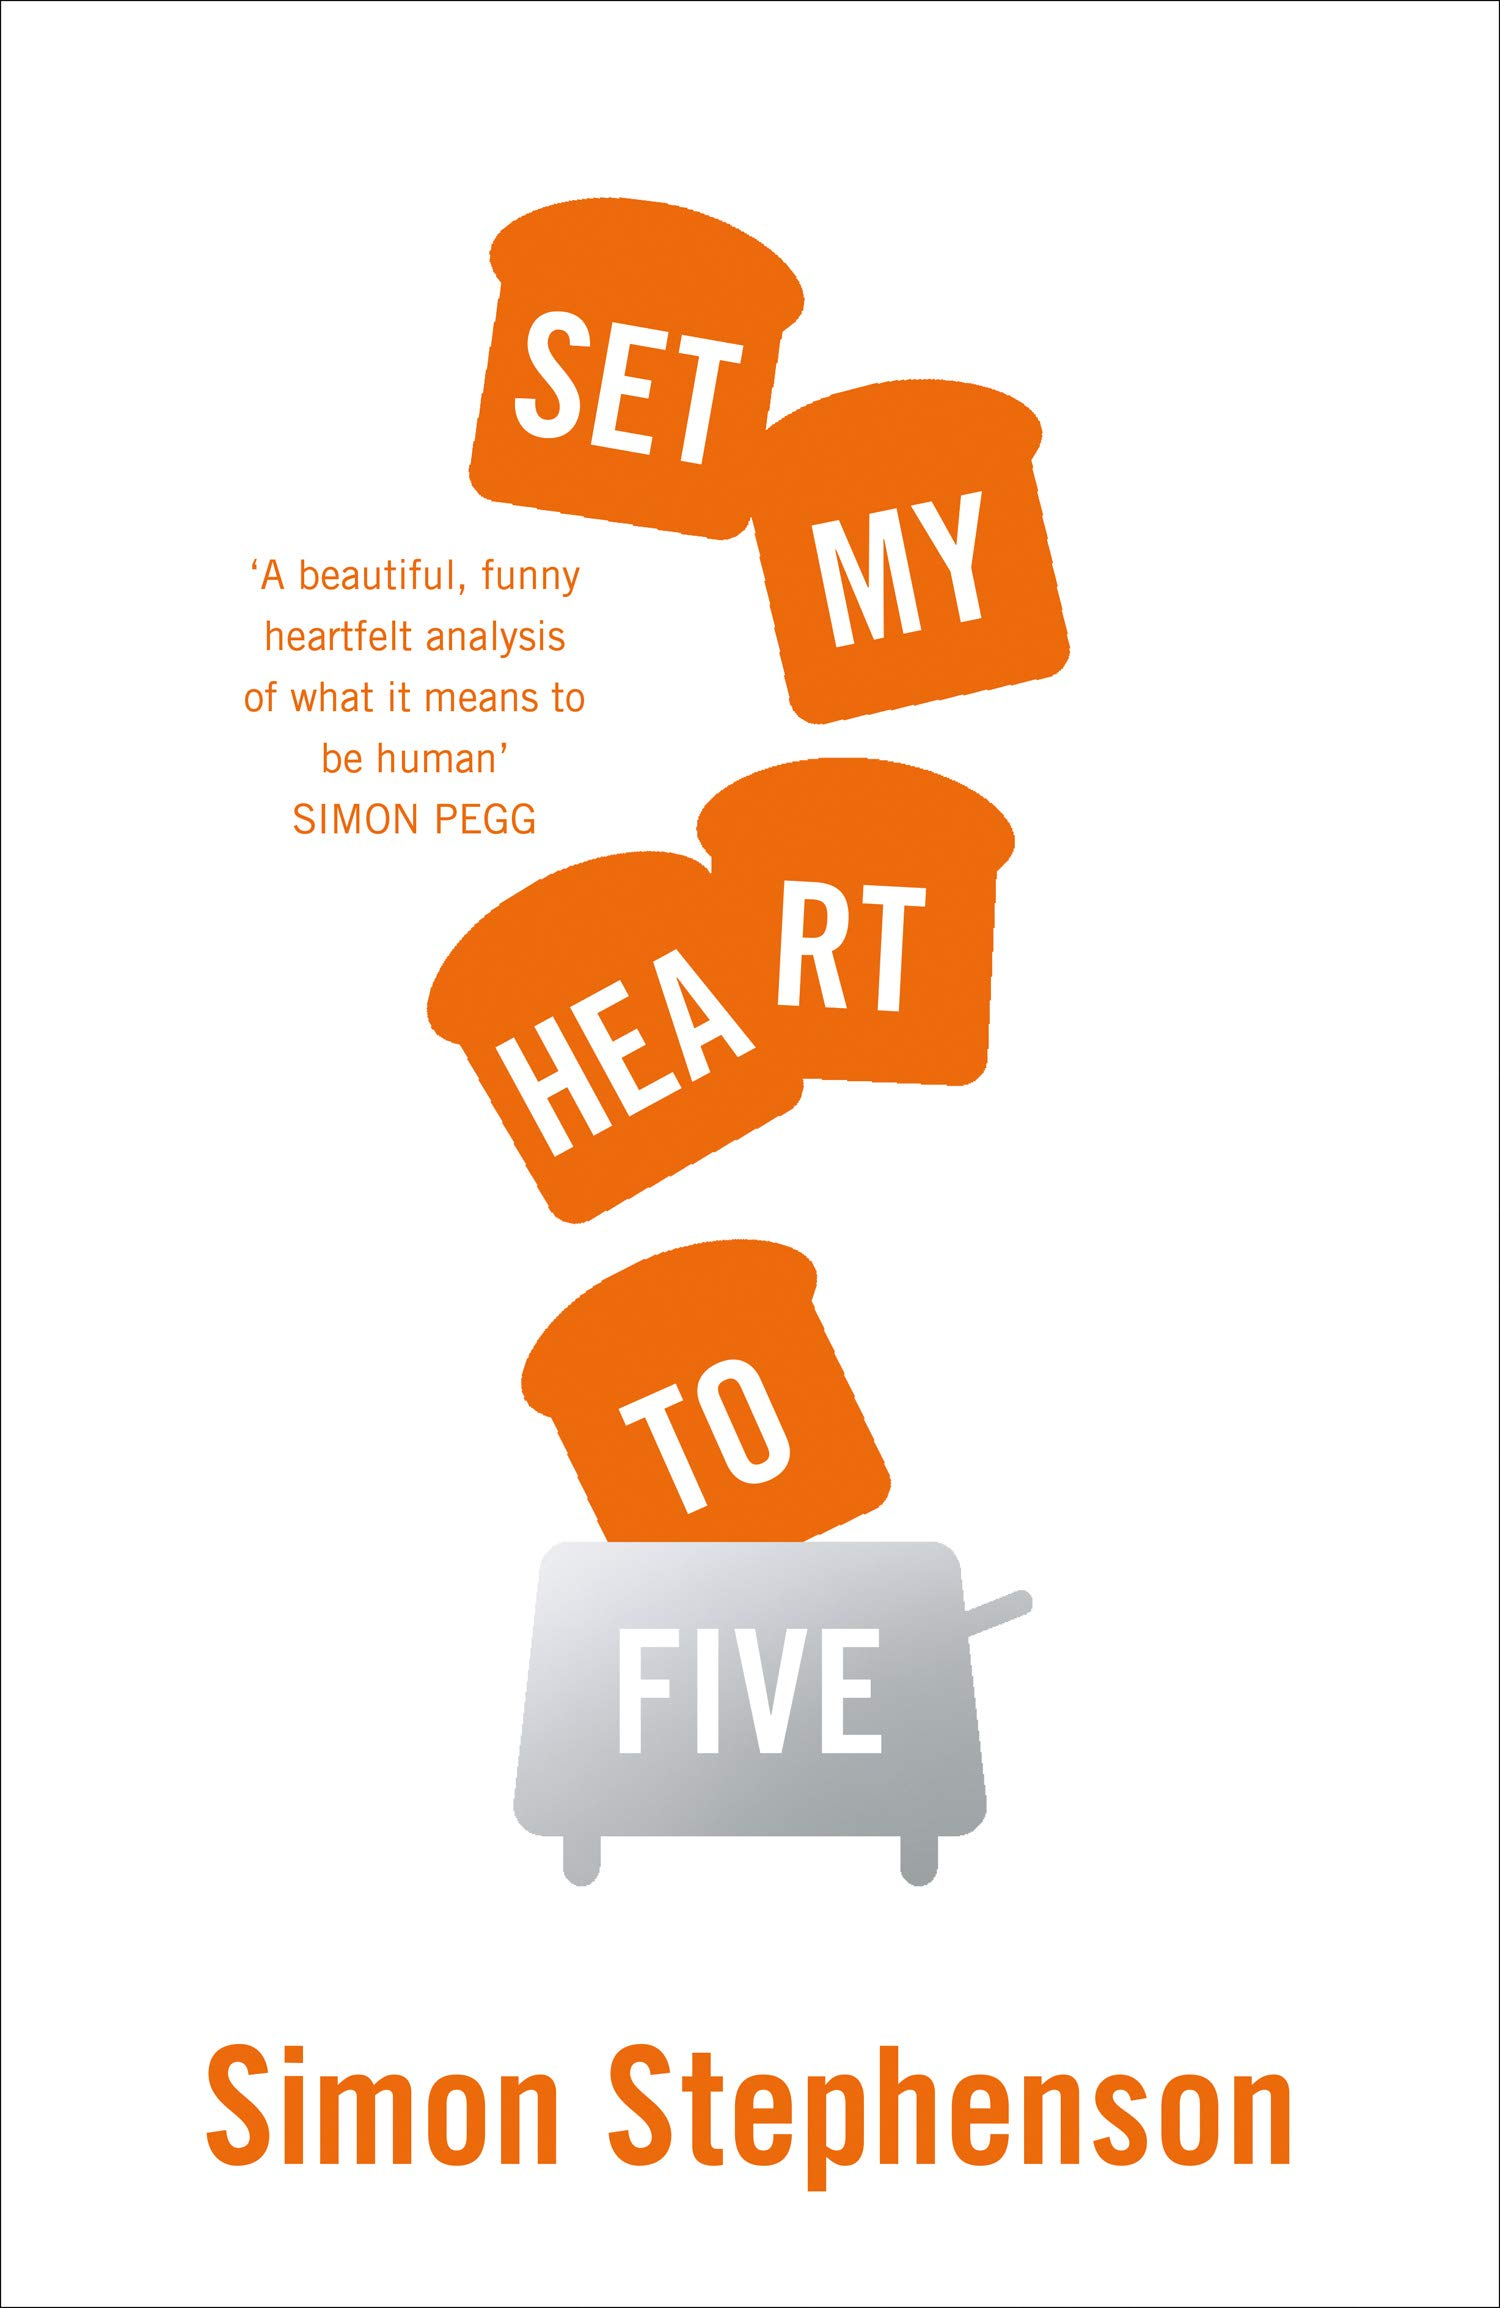 Set My Heart To Five: Amazon.co.uk: Stephenson, Simon: 9780008354206: Books